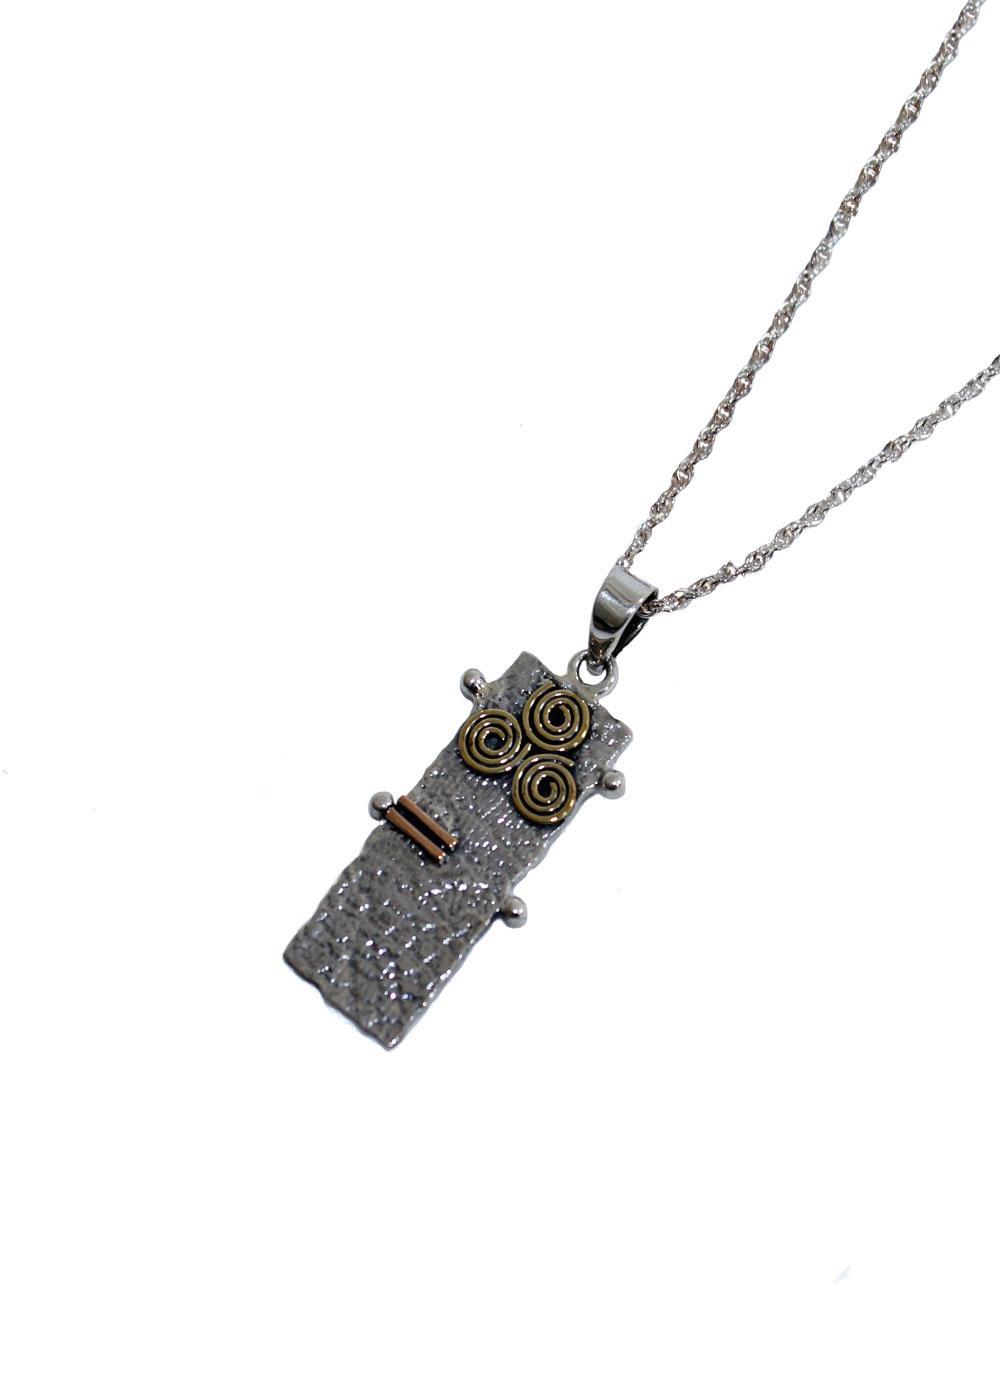 Banshee silver ogham pendant blarney banshee silver ogham pendant aloadofball Images